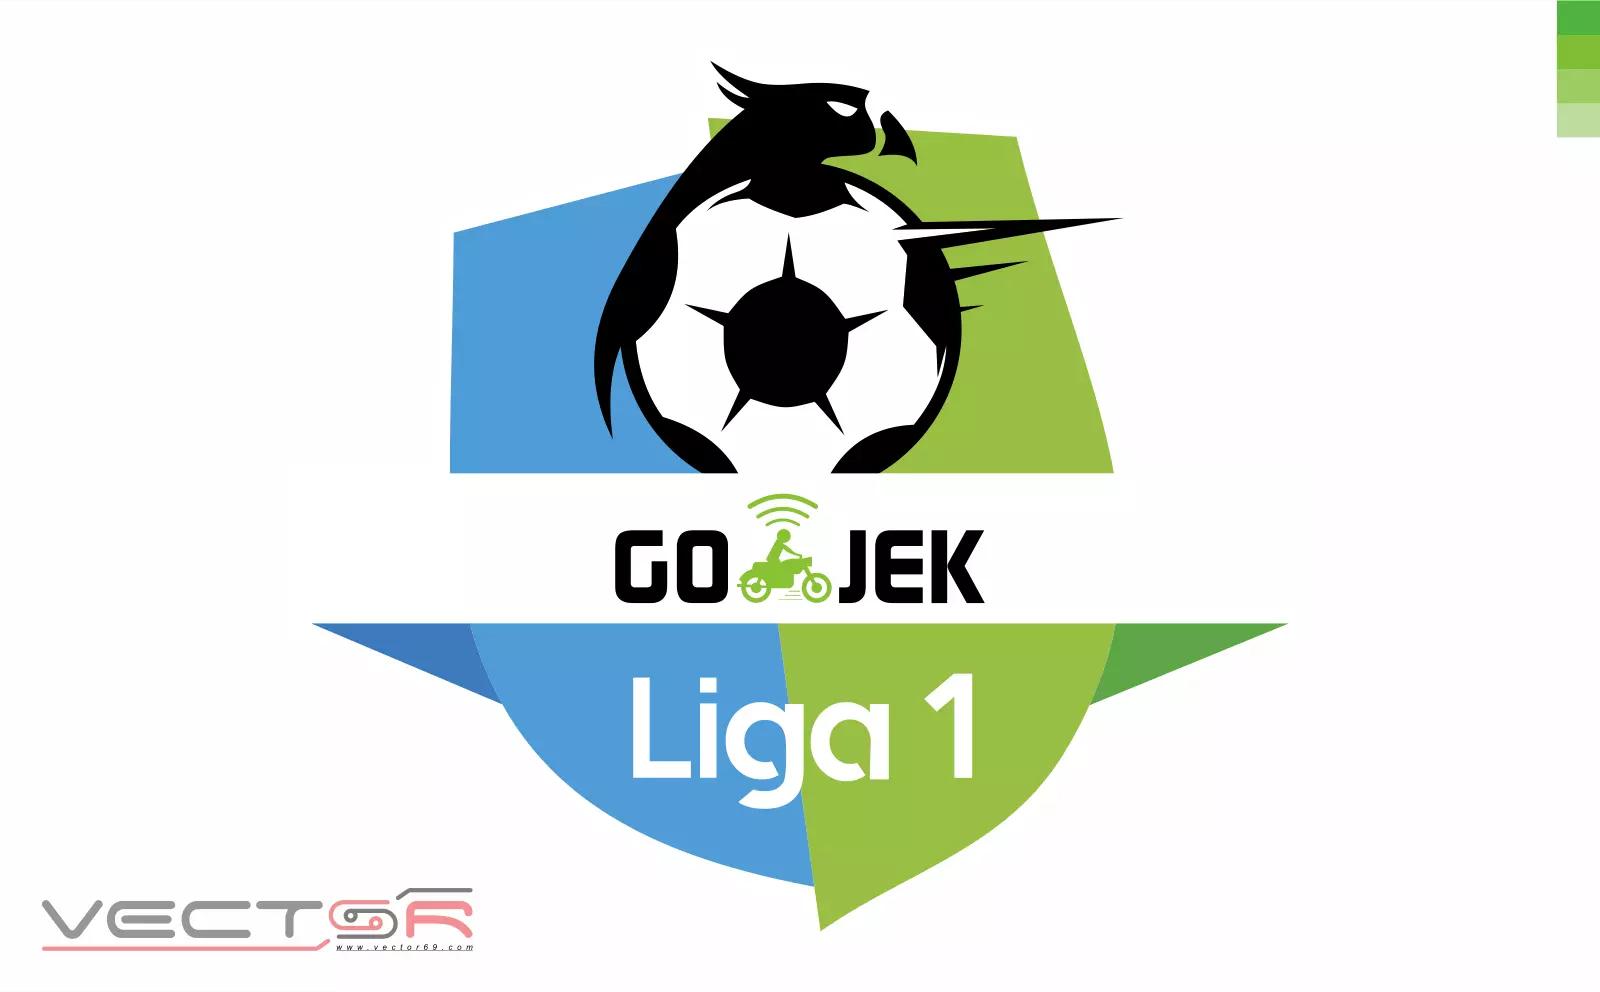 Gojek Liga 1 Indonesia Logo - Download Vector File CDR (CorelDraw)